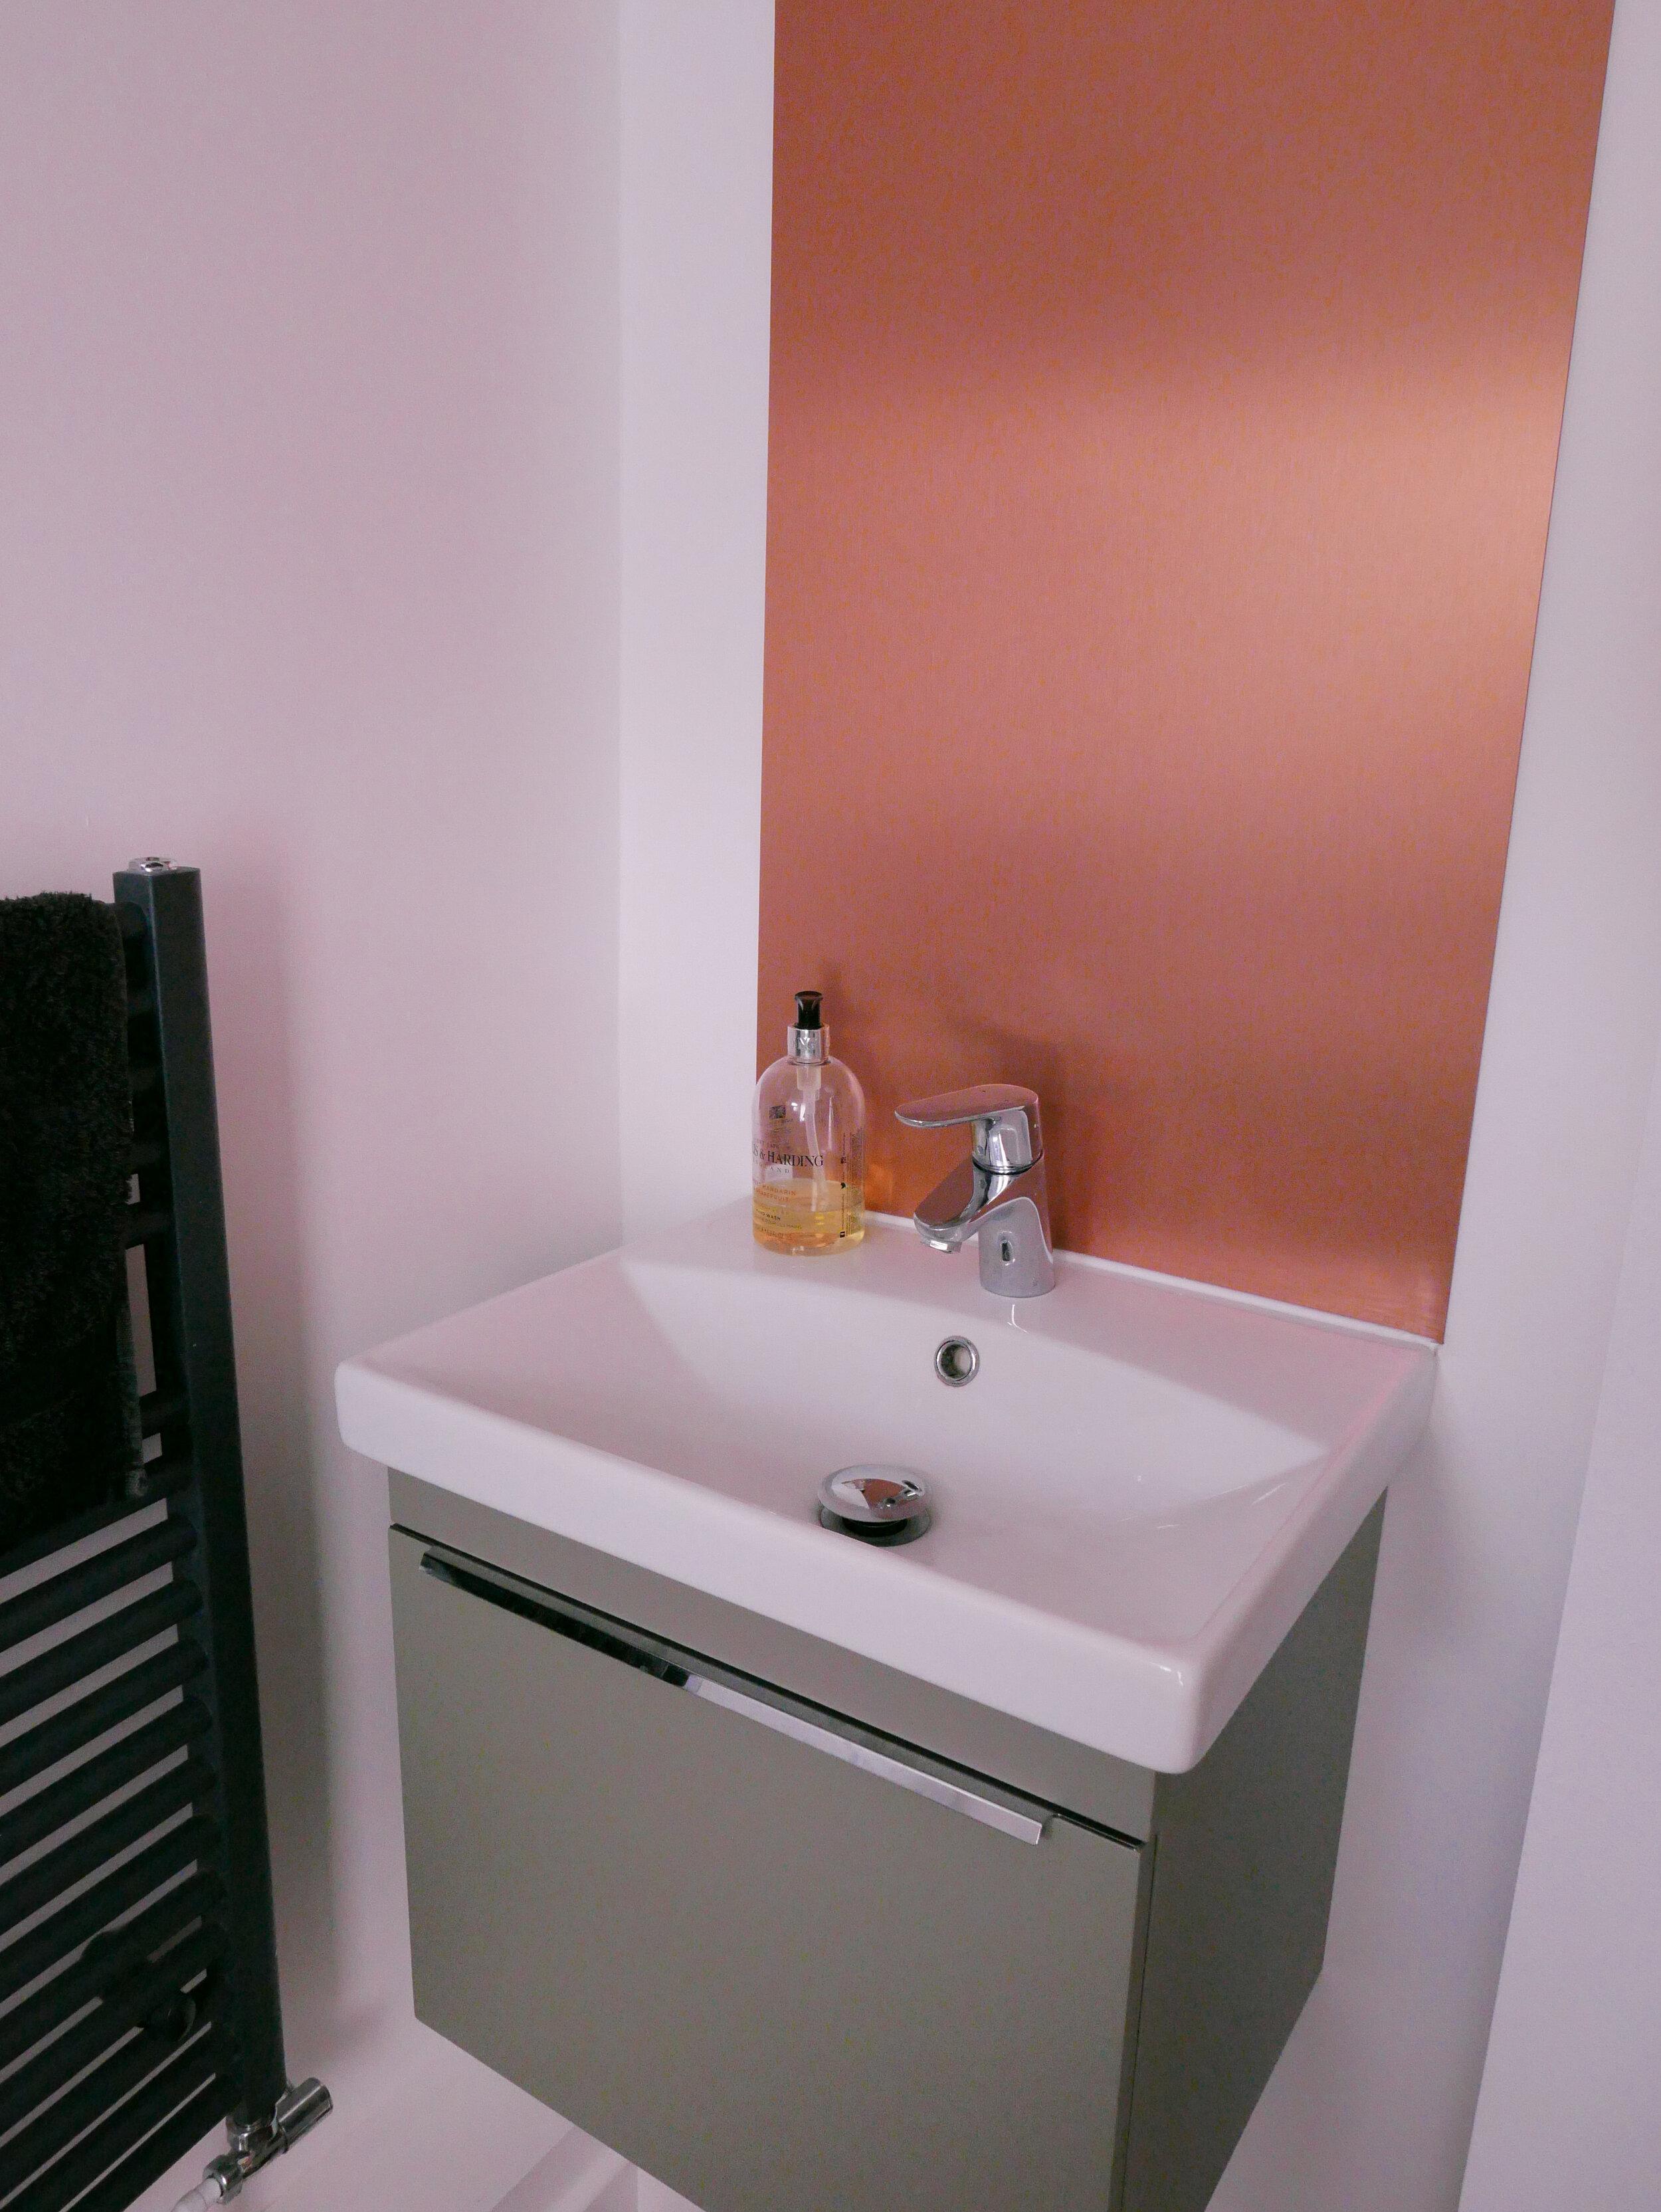 Copper Backsplash Accessible WC Design South Woodford